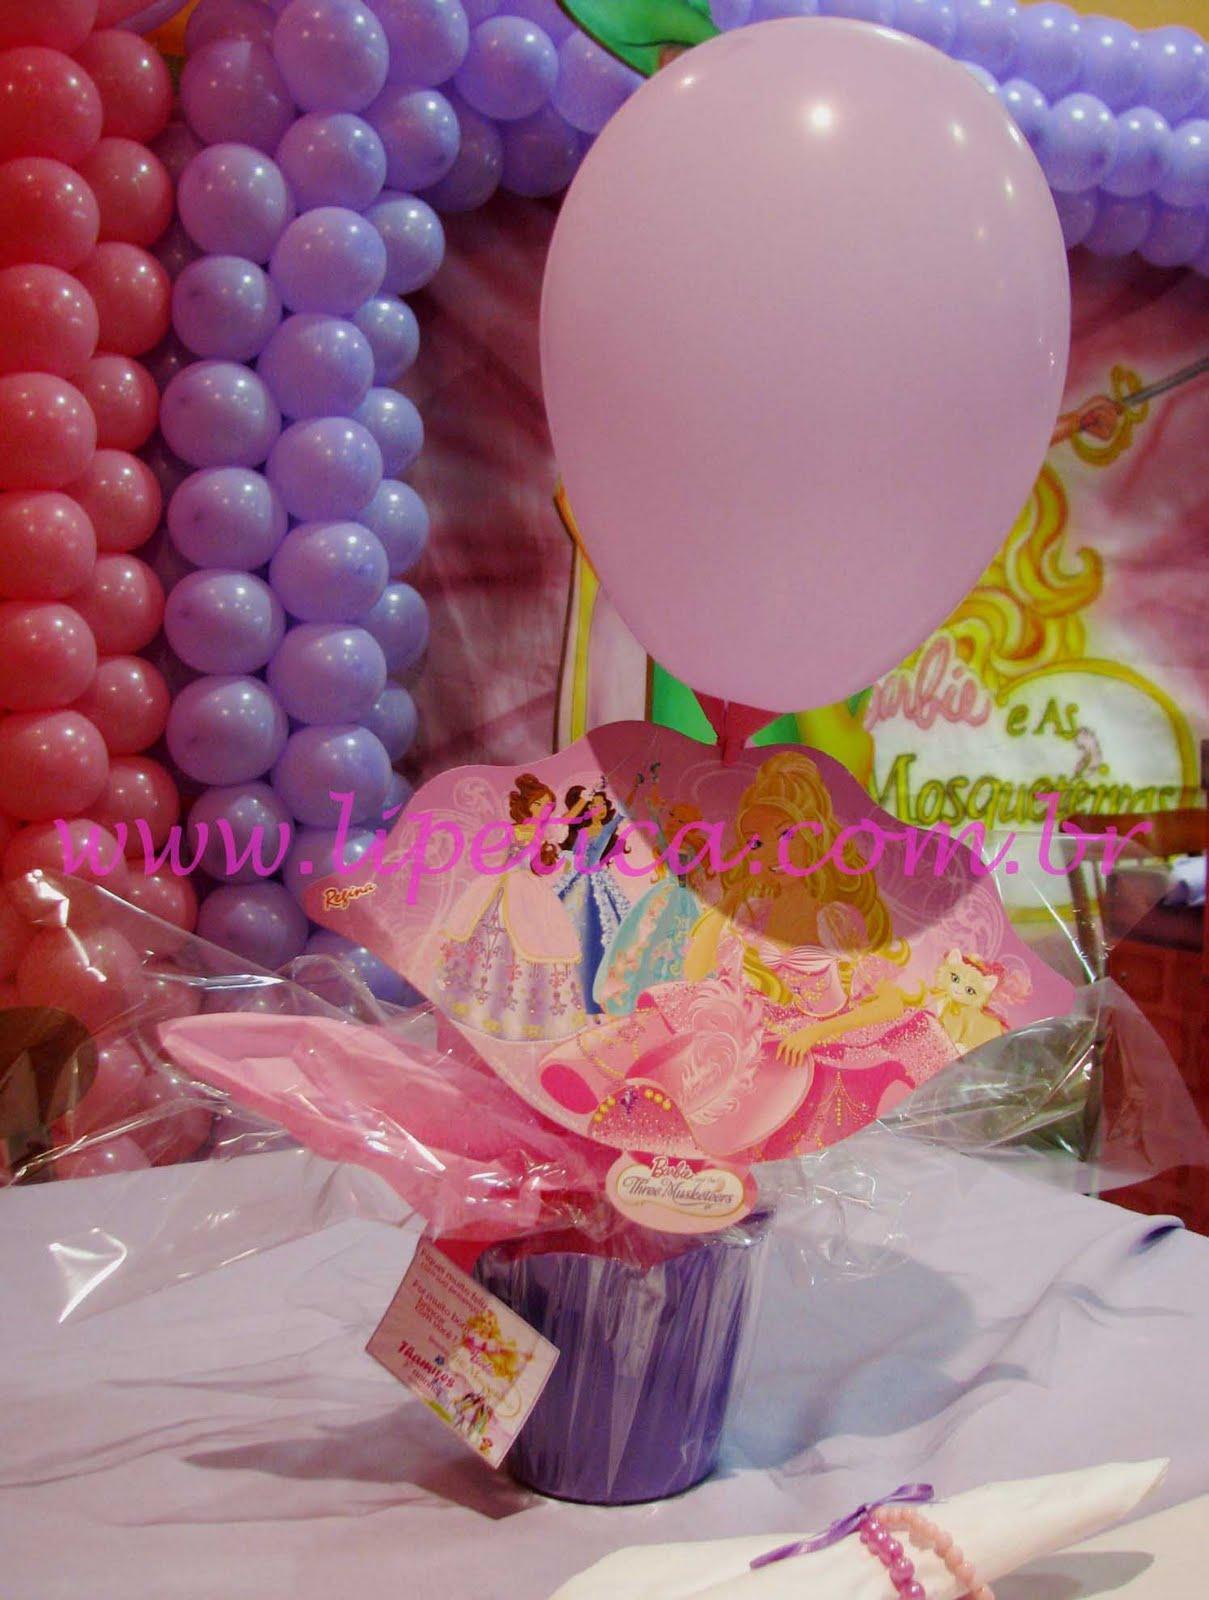 Centro De Mesa Barbie E As 3 Mosqueitas